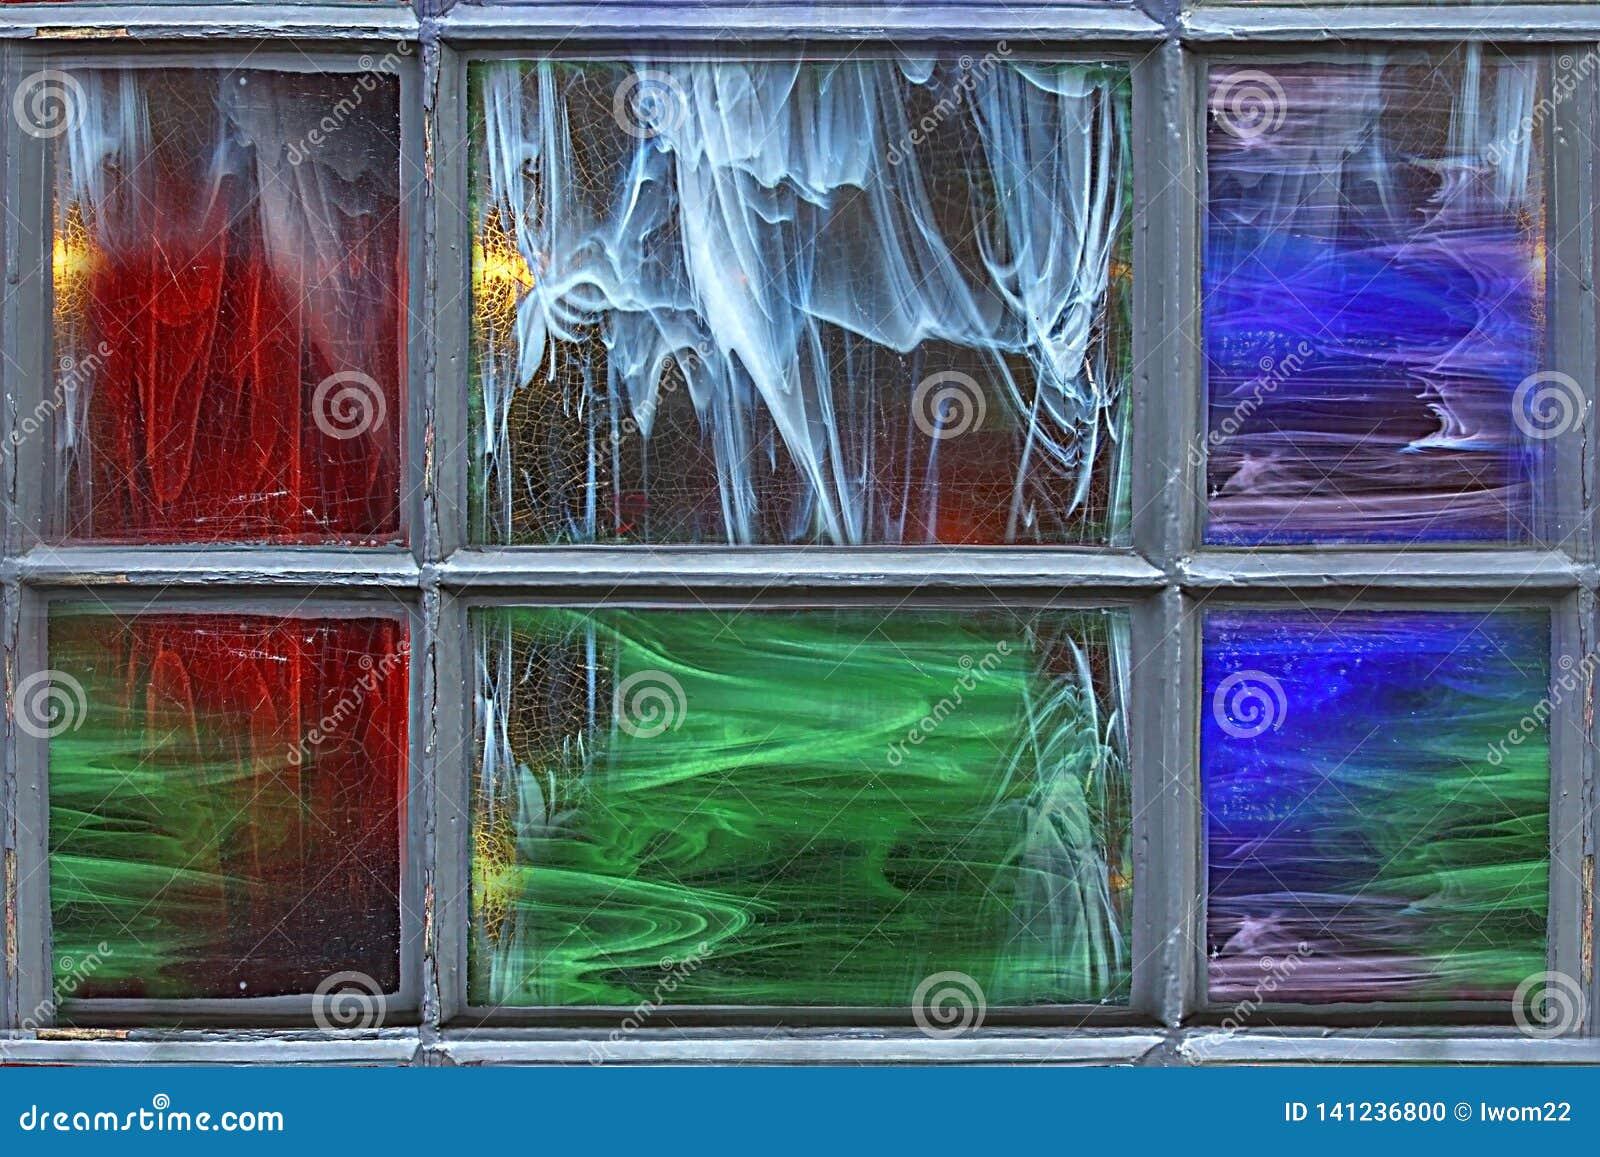 Unduh 50 Background Art Window HD Gratis